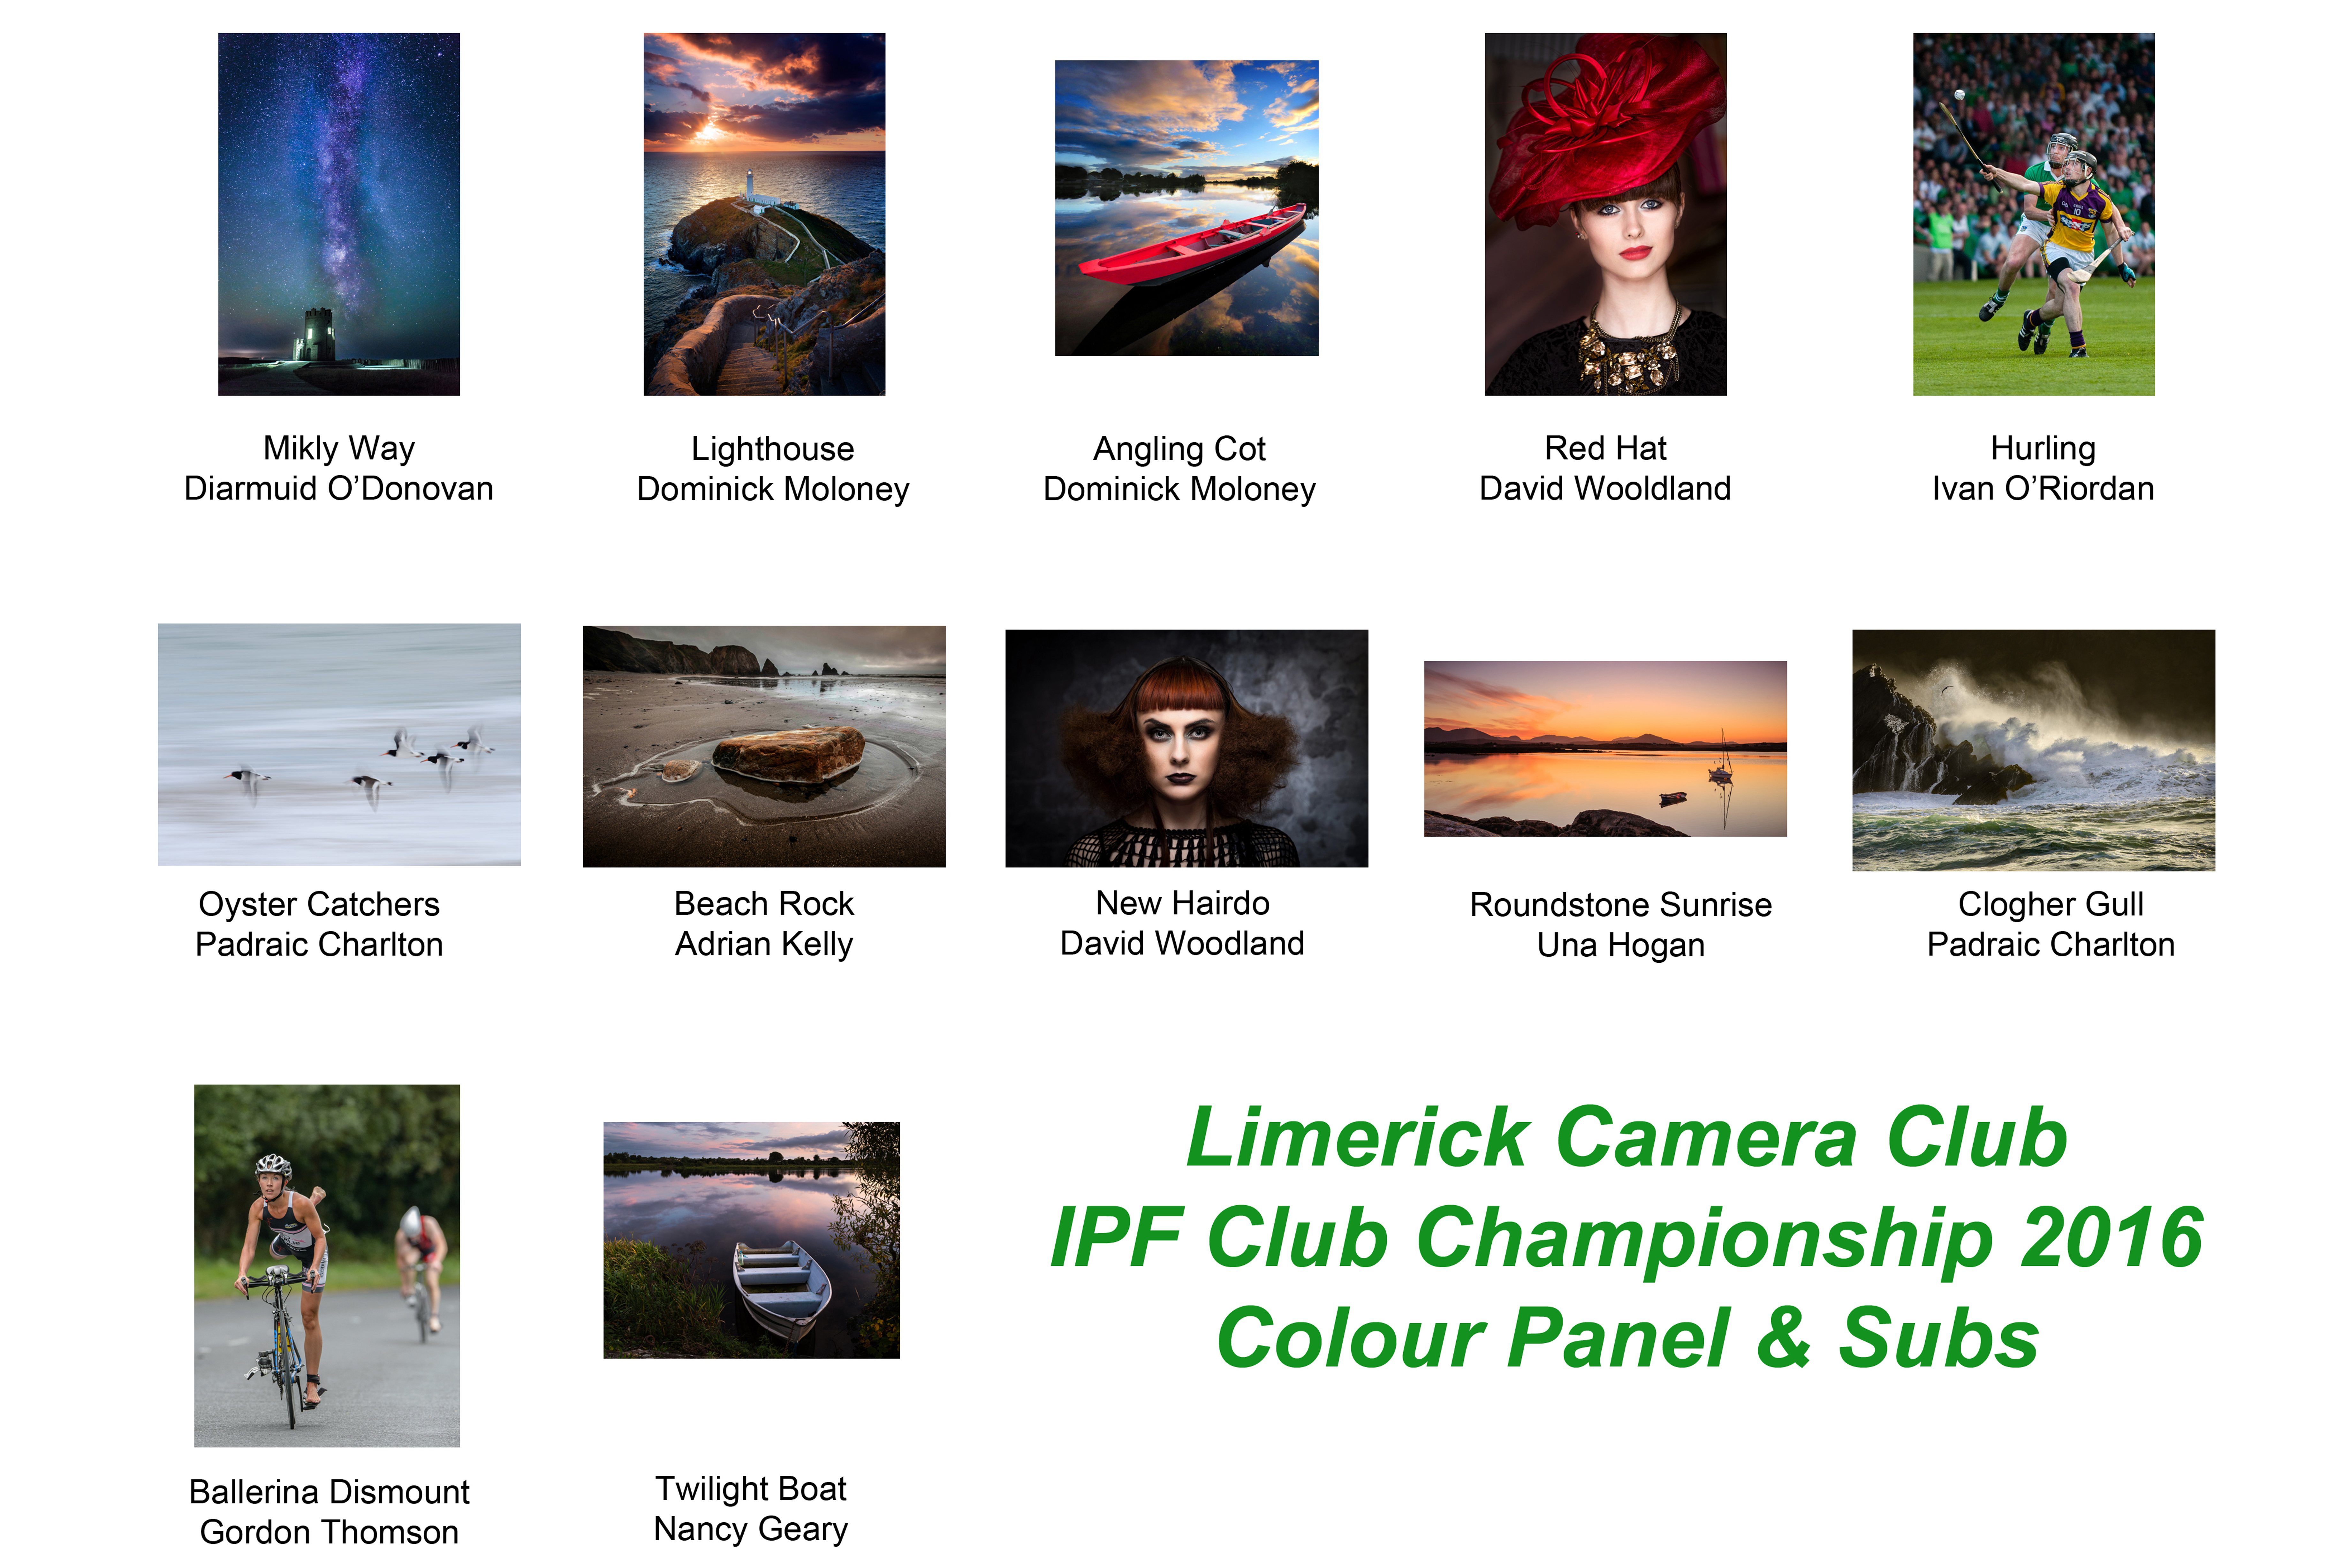 IPF Club Championships 2016 - Colour